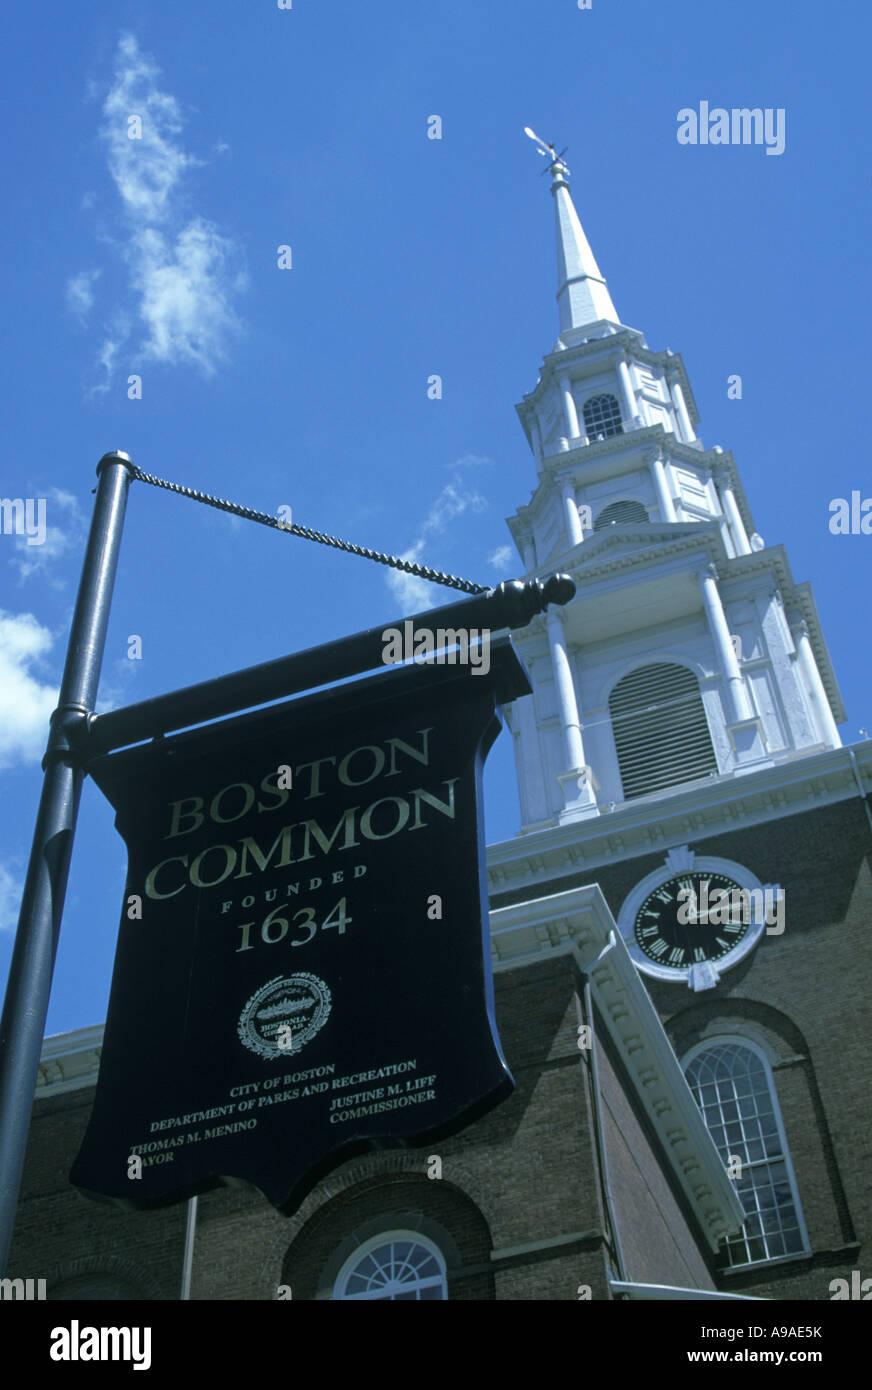 COMMON SIGN BOSTON  MASSACHUSSETTS USA - Stock Image